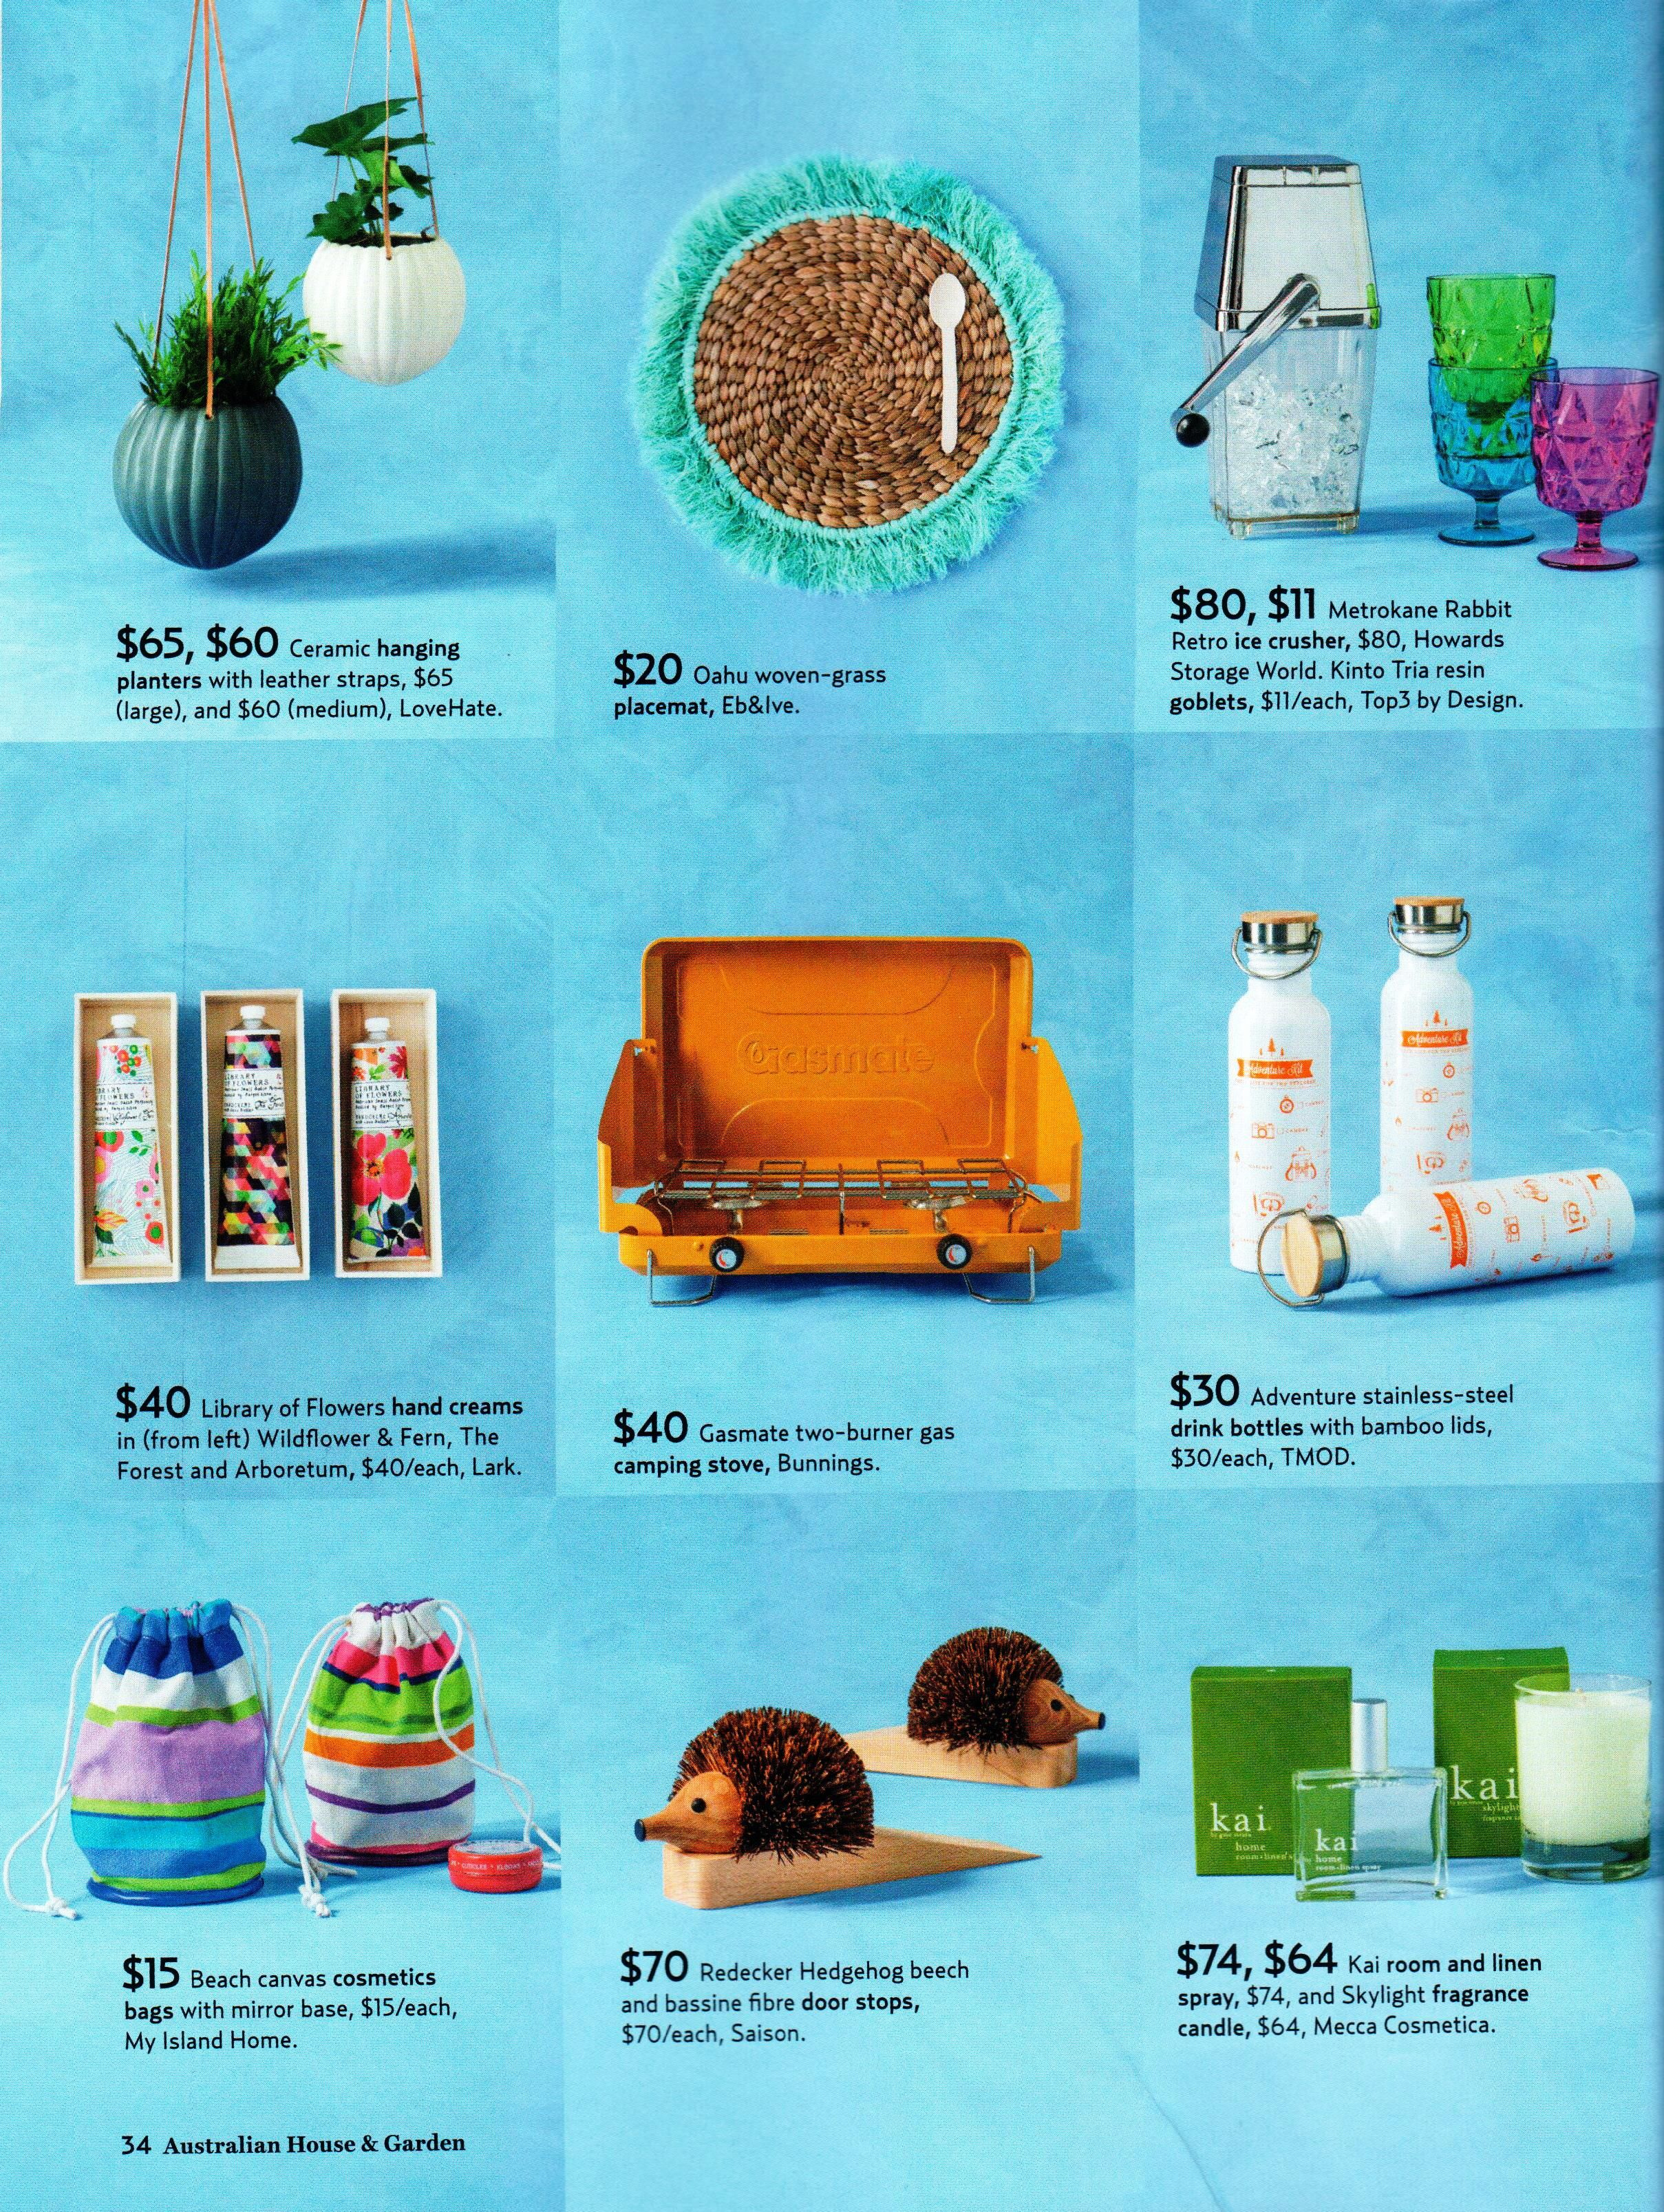 House & Garden - eb&ive Oahu woven - grass placemat